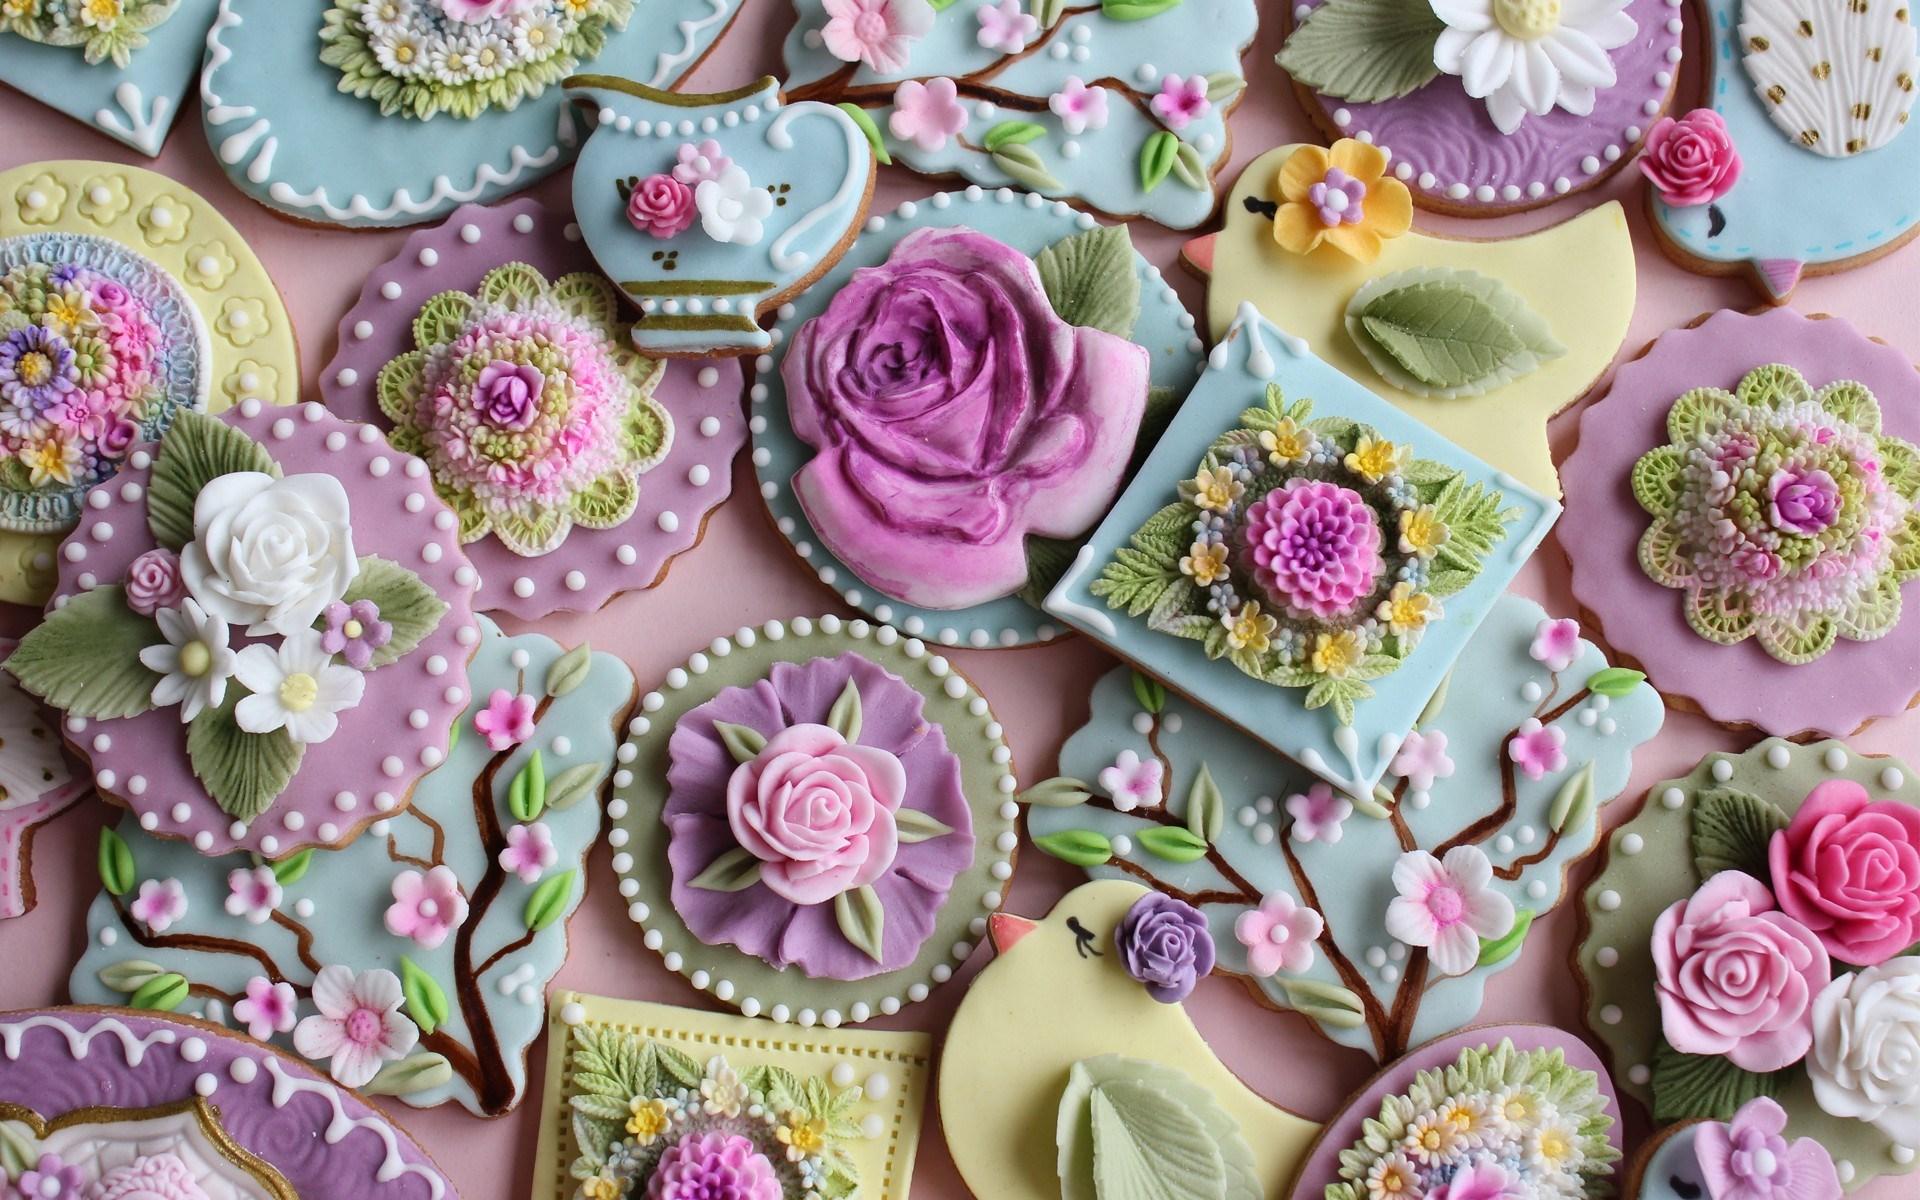 3d Valentines Live Wallpaper Cookies Flowers Food Hd Desktop Wallpapers 4k Hd